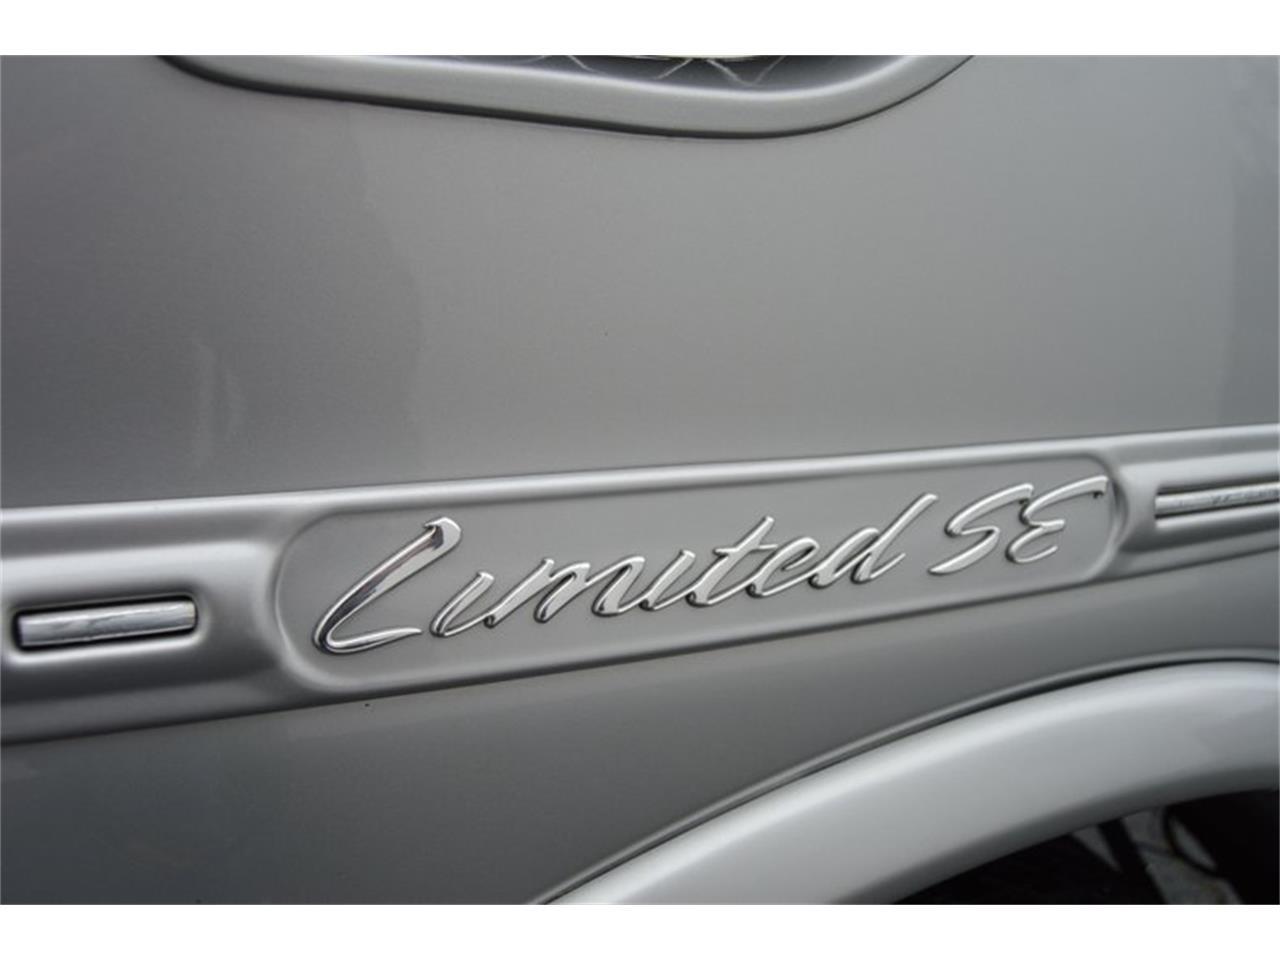 2013 GMC Savana (CC-1329336) for sale in Springfield, Massachusetts